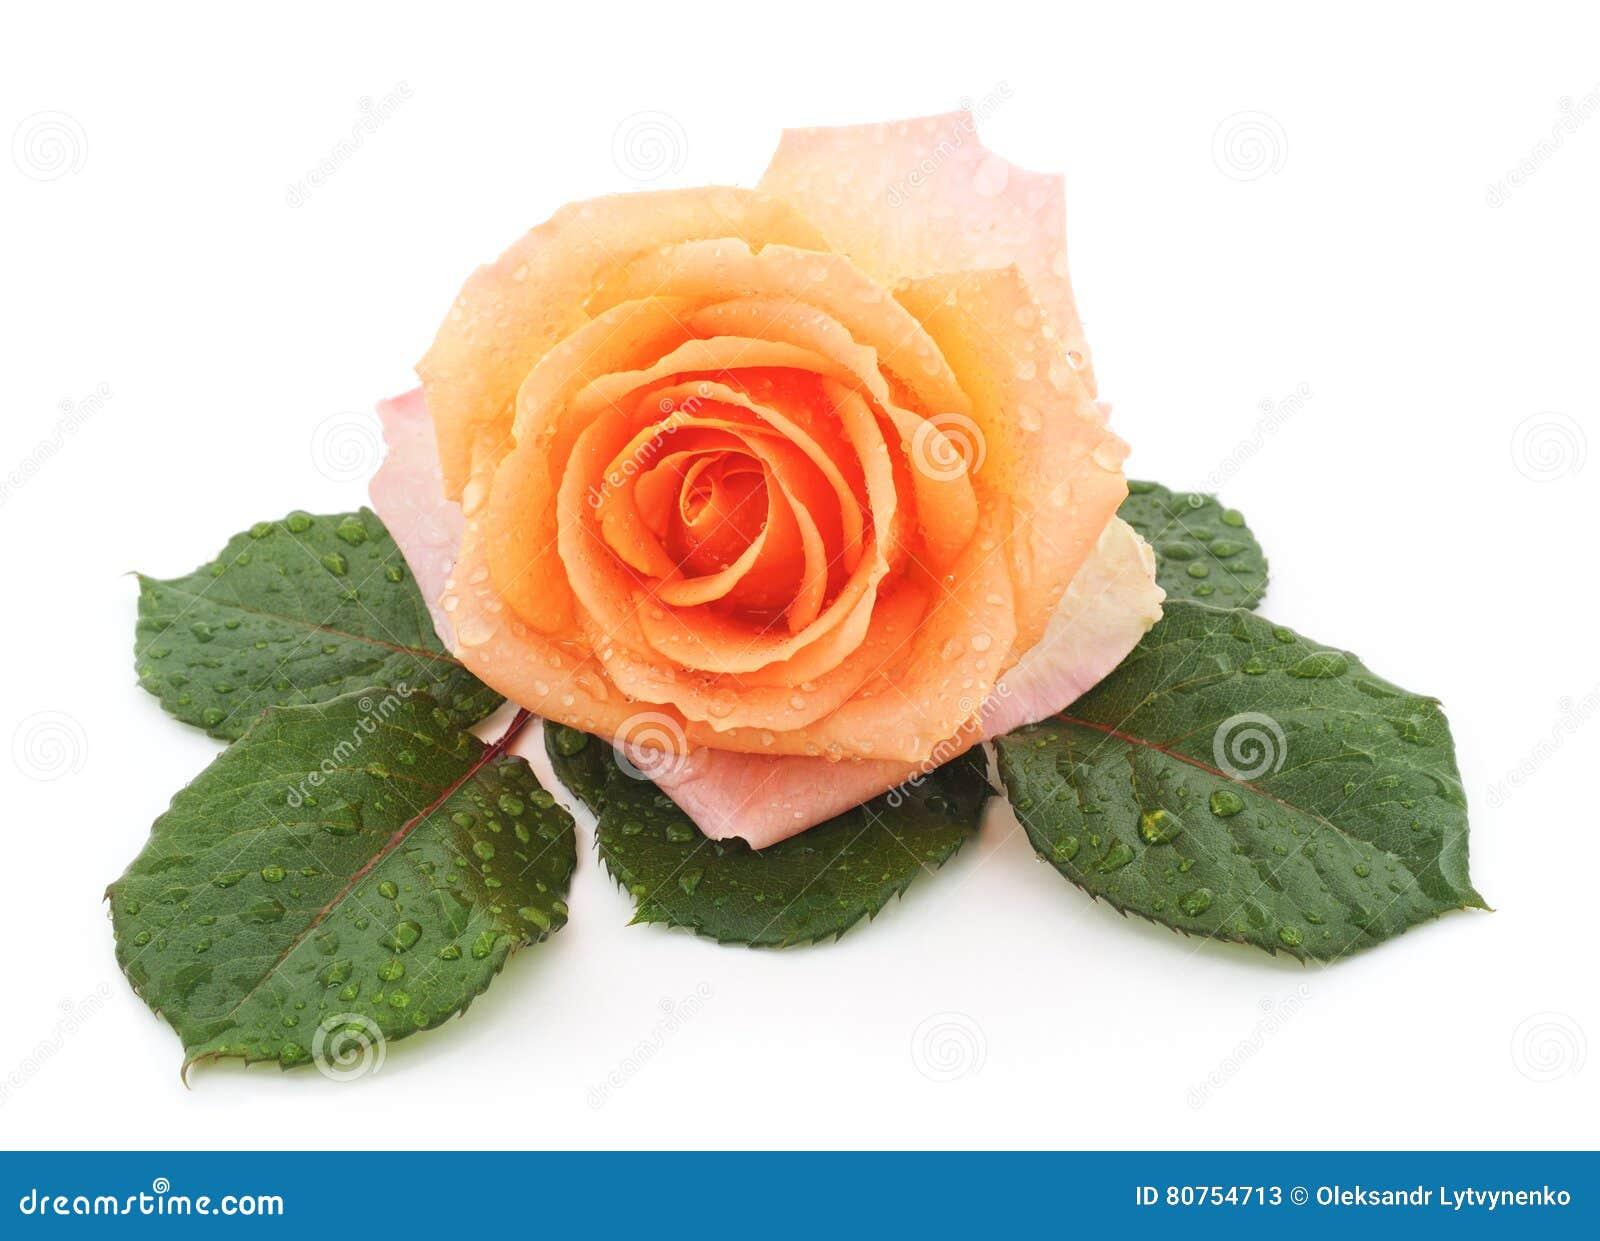 Orange rose after a rain.